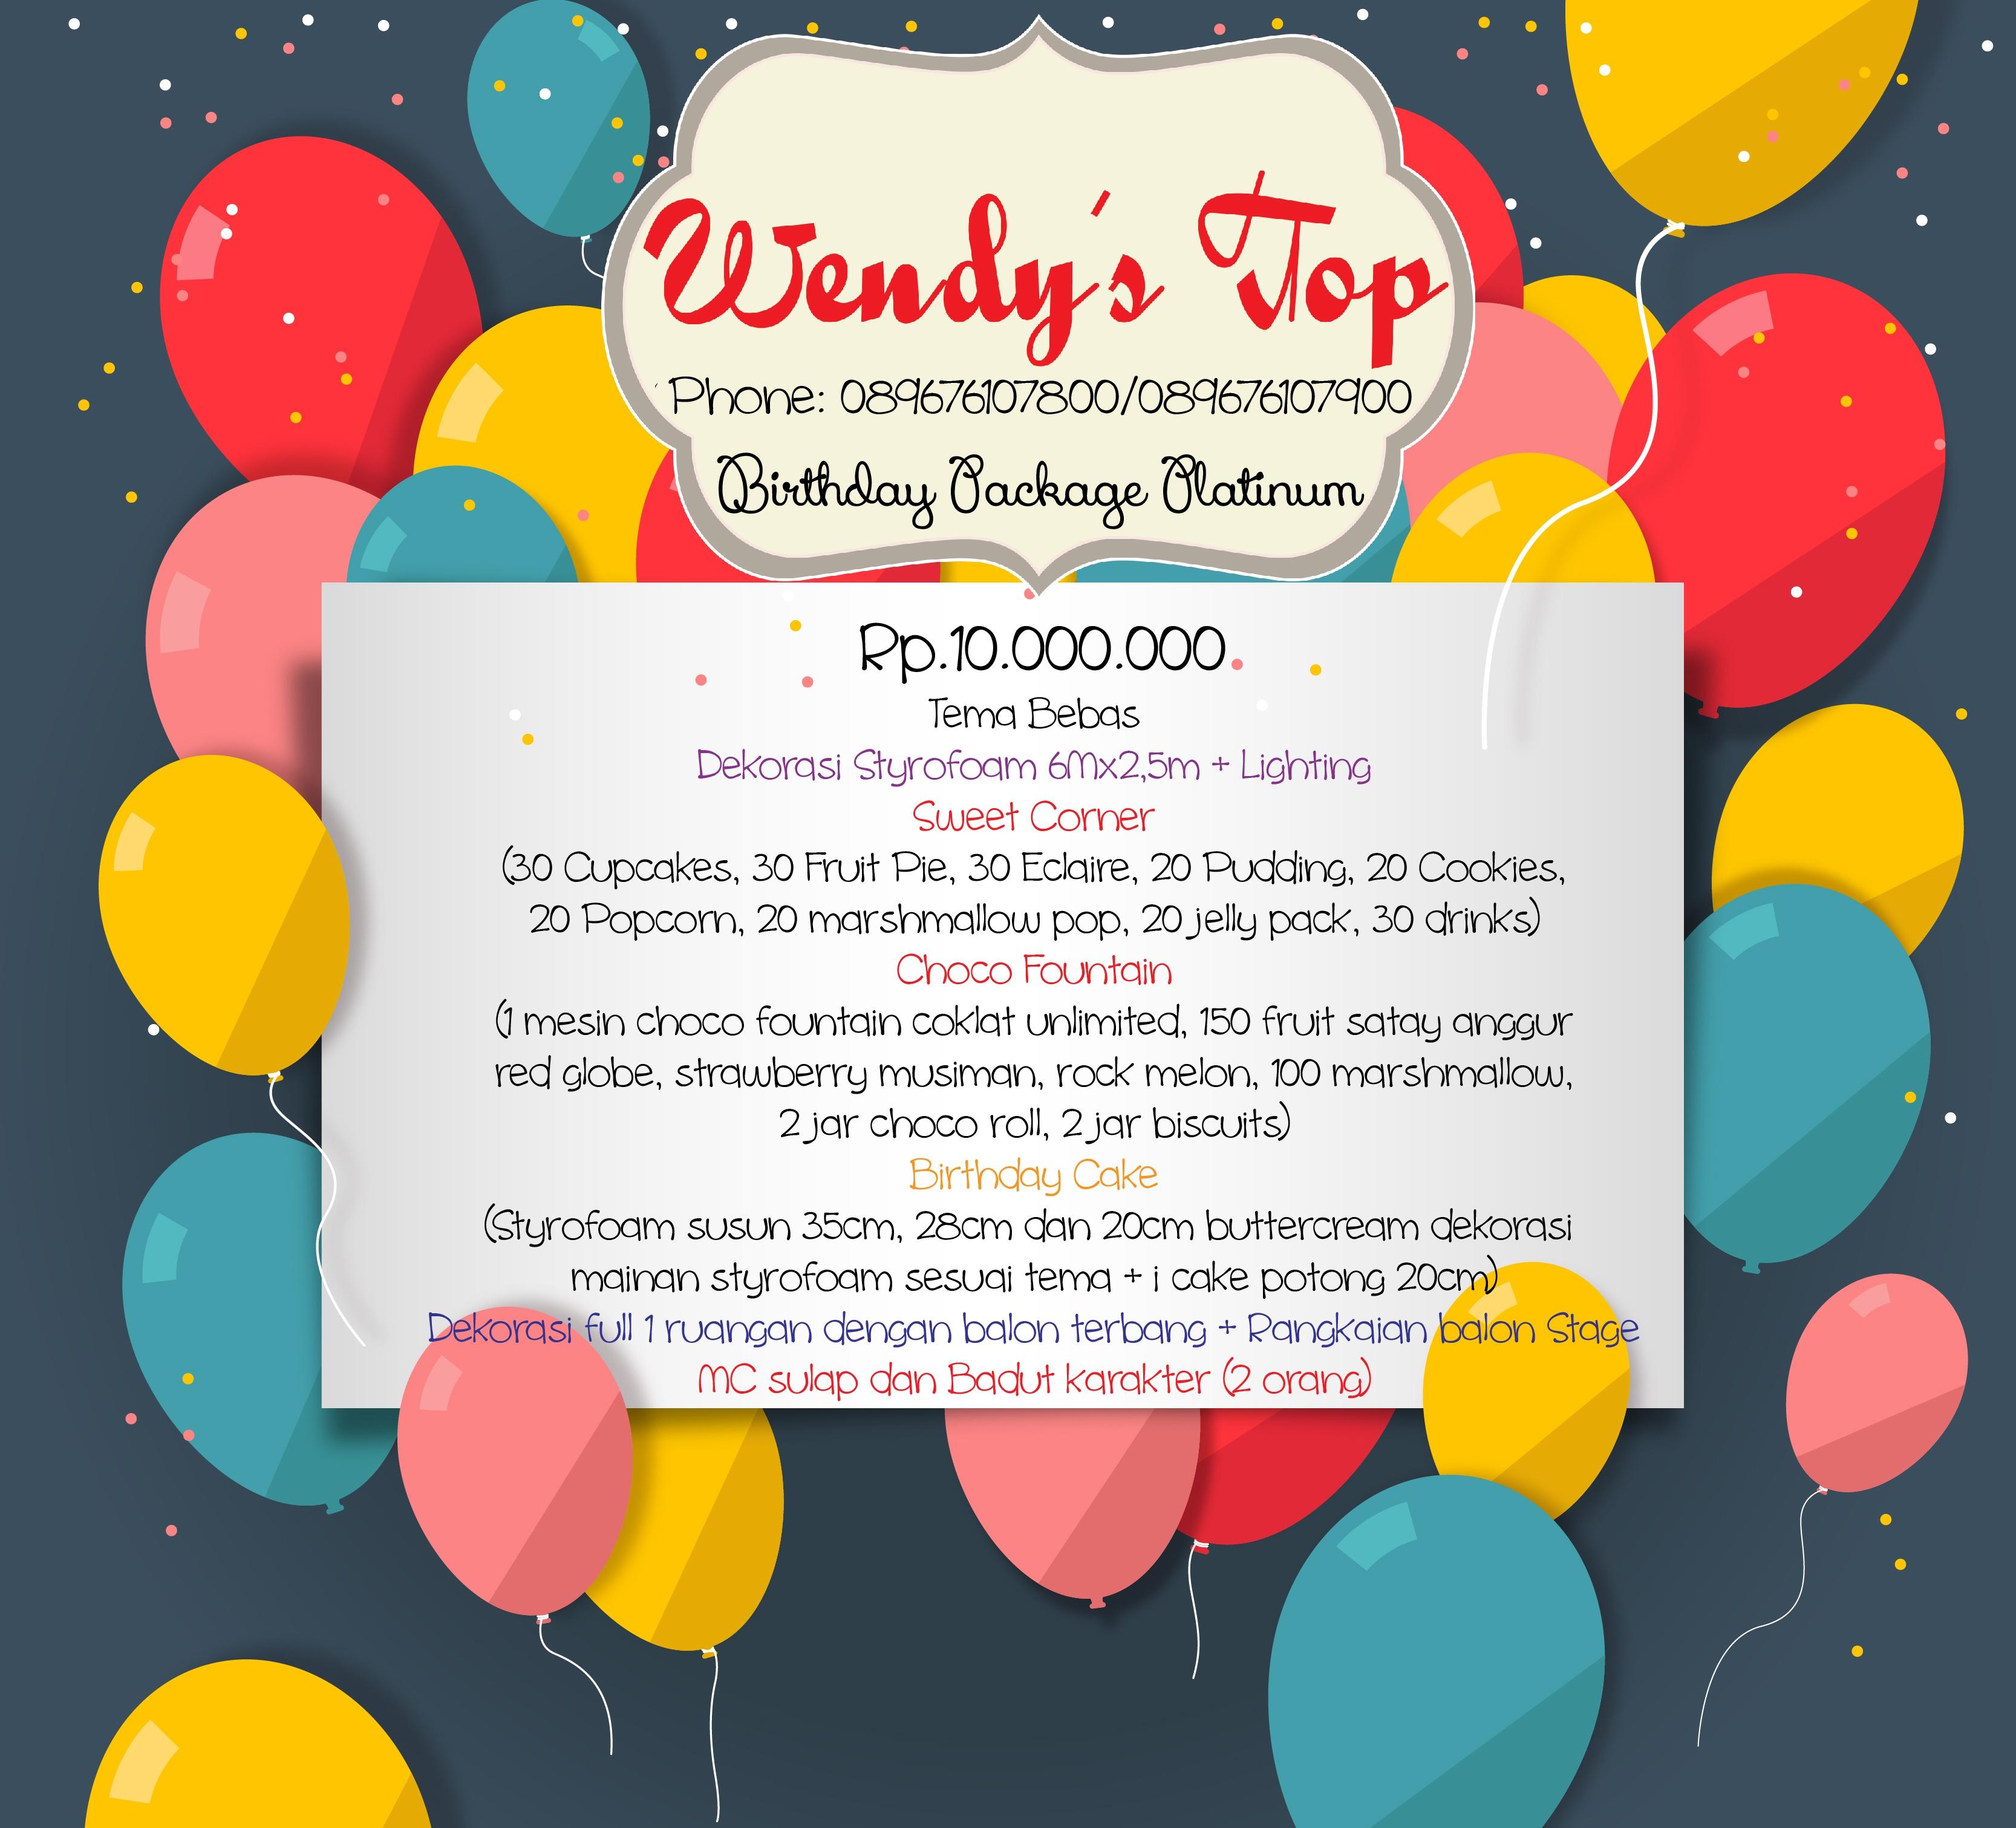 Paket Ulang Tahun Wendy S Top